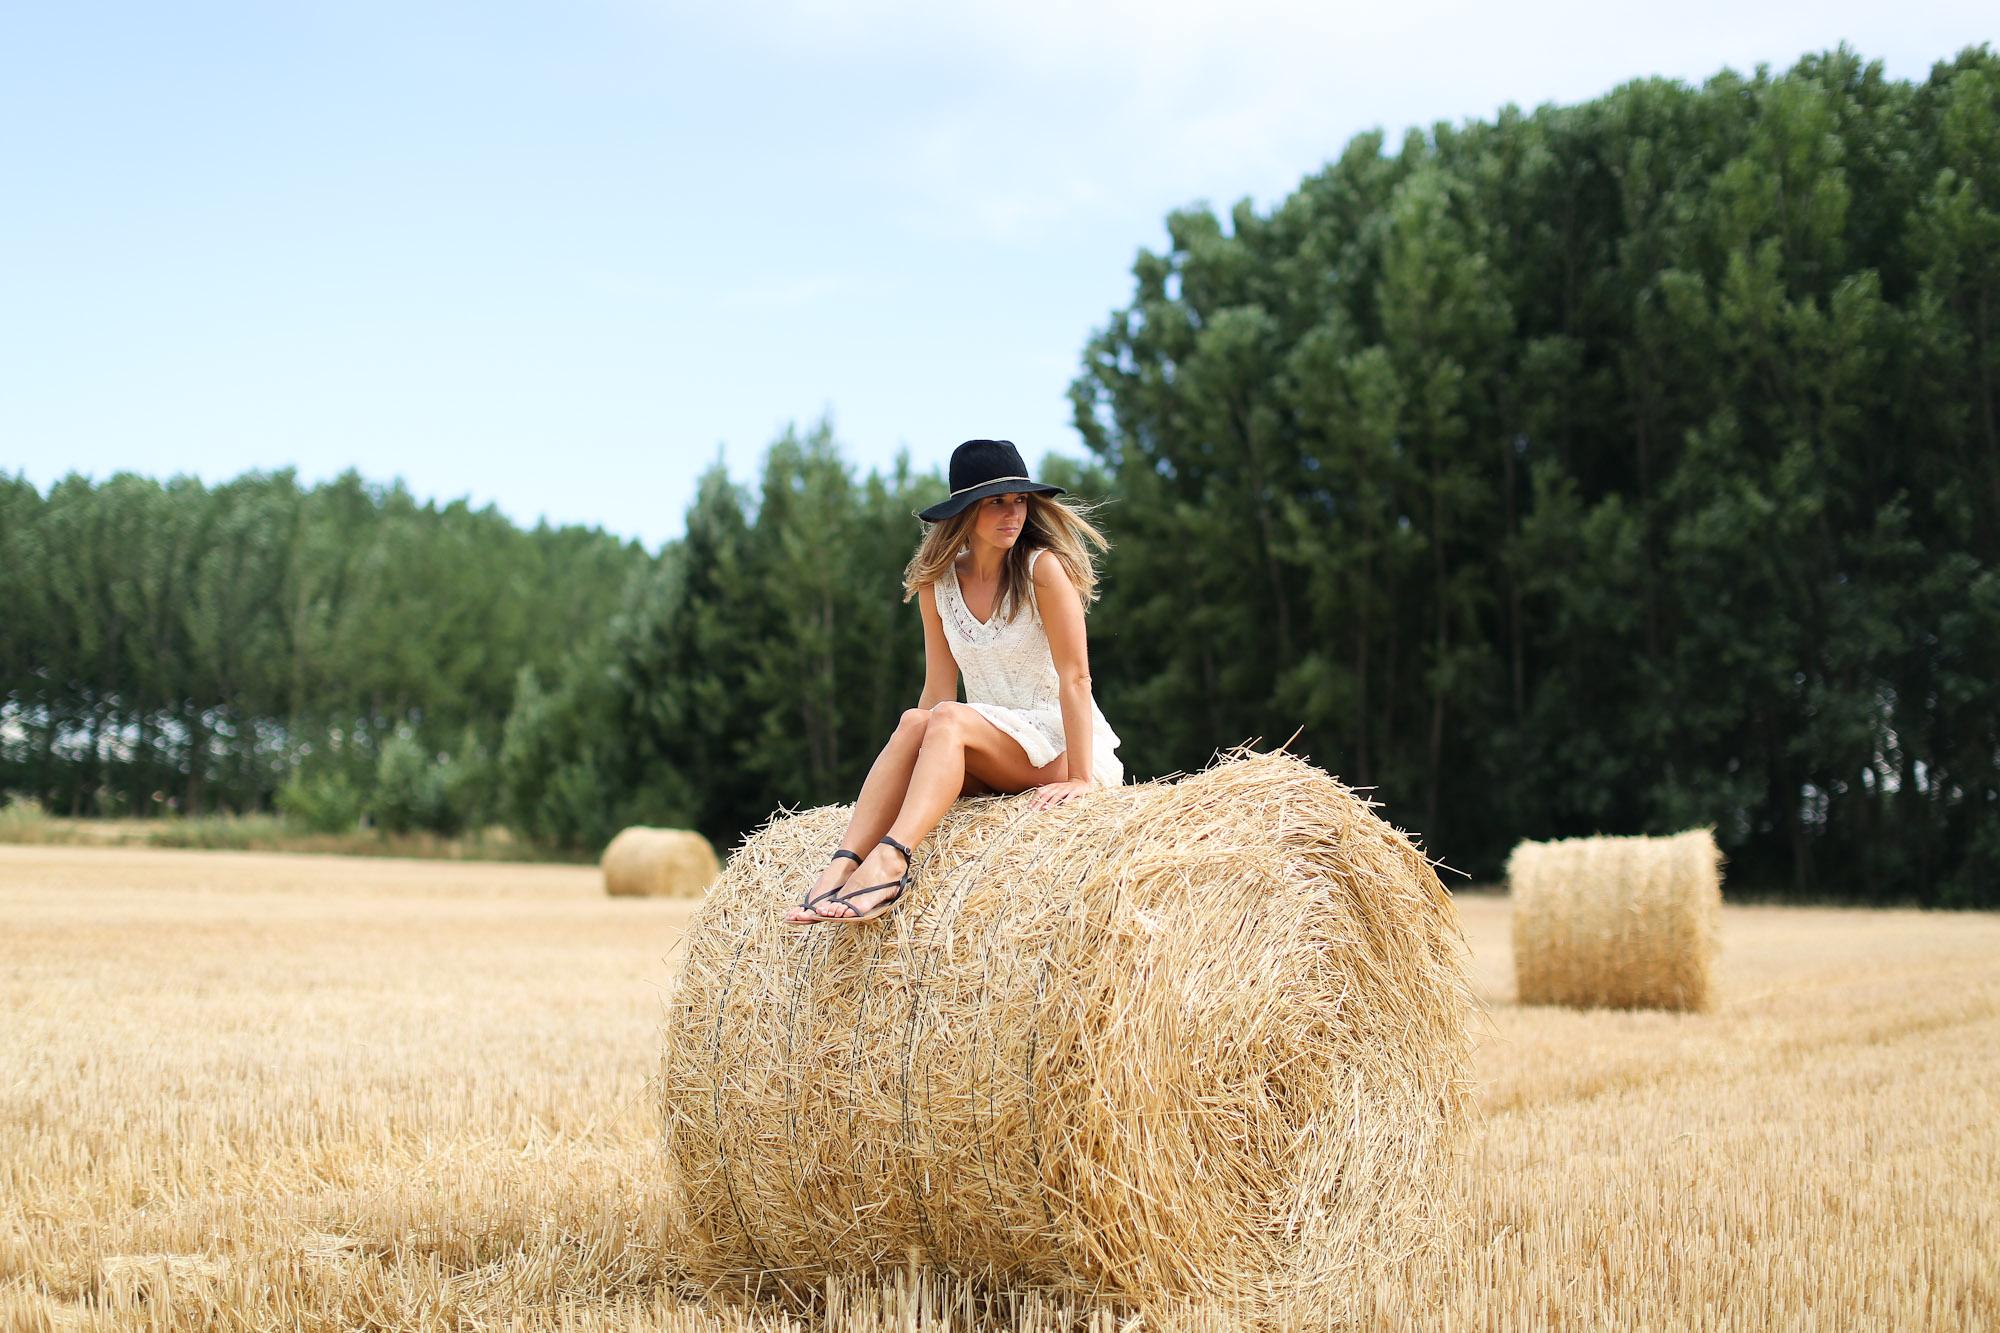 Clochet_sandro_anik_leather_Bag_long_crochet_dress_fedora_hat-6